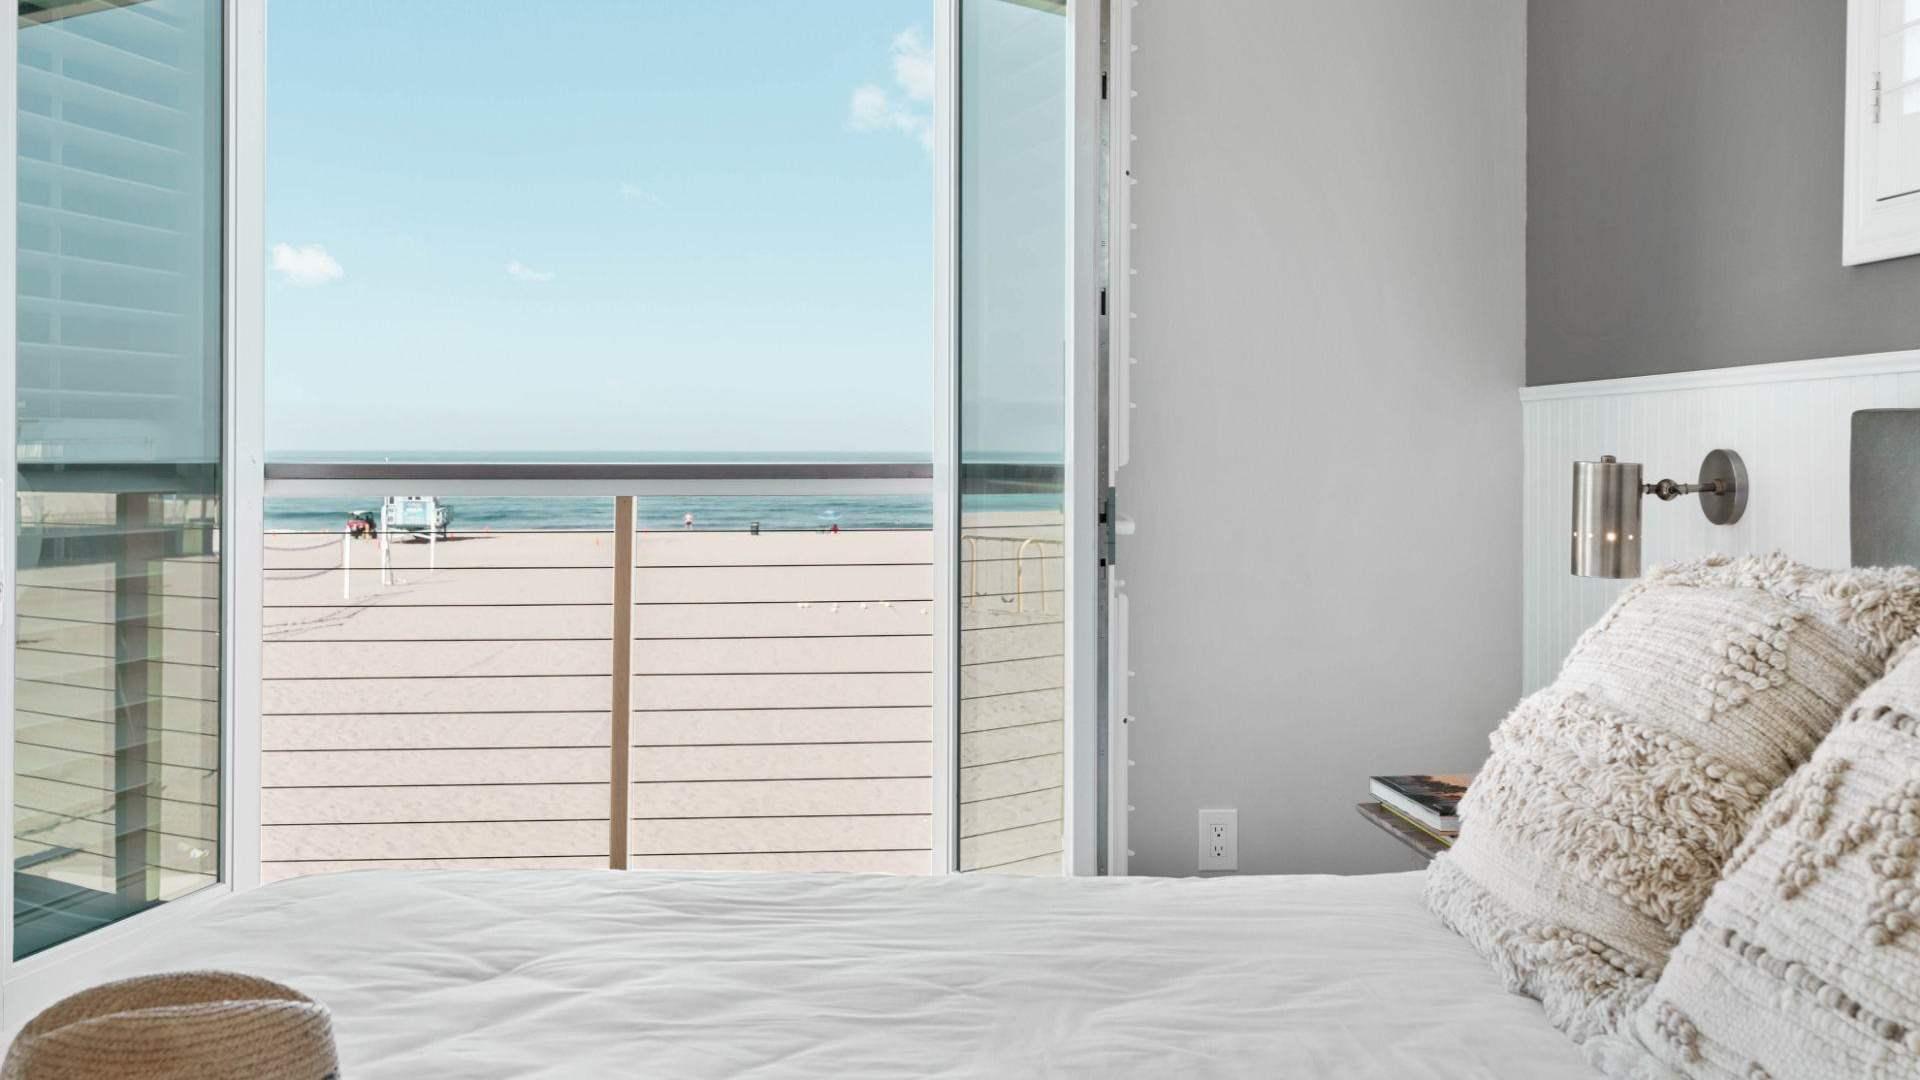 Sea Sprite Hotel, Hermosa Beach